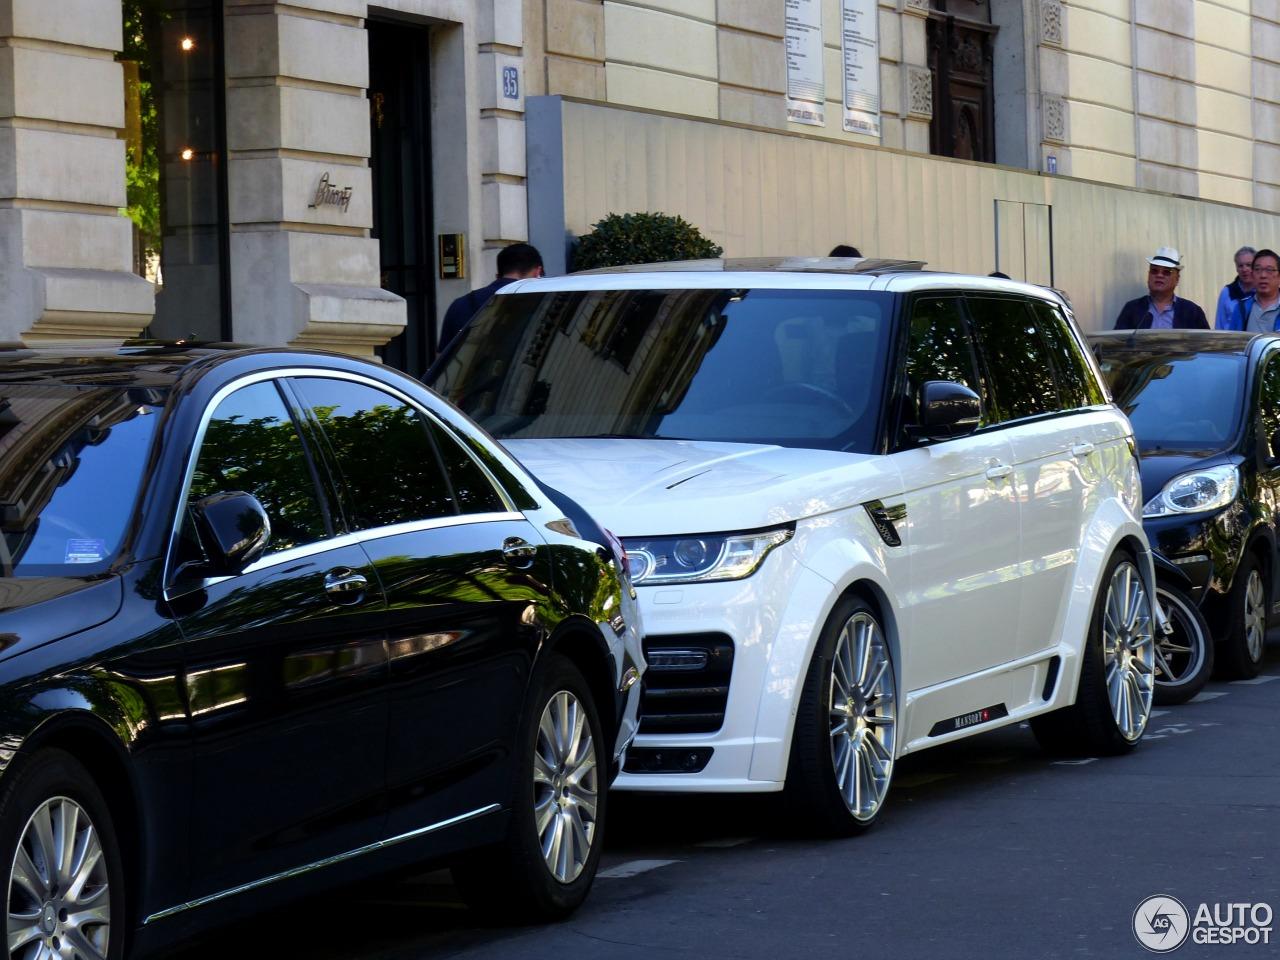 Land Rover Mansory Range Rover Sport 2013 15 Avril 2015